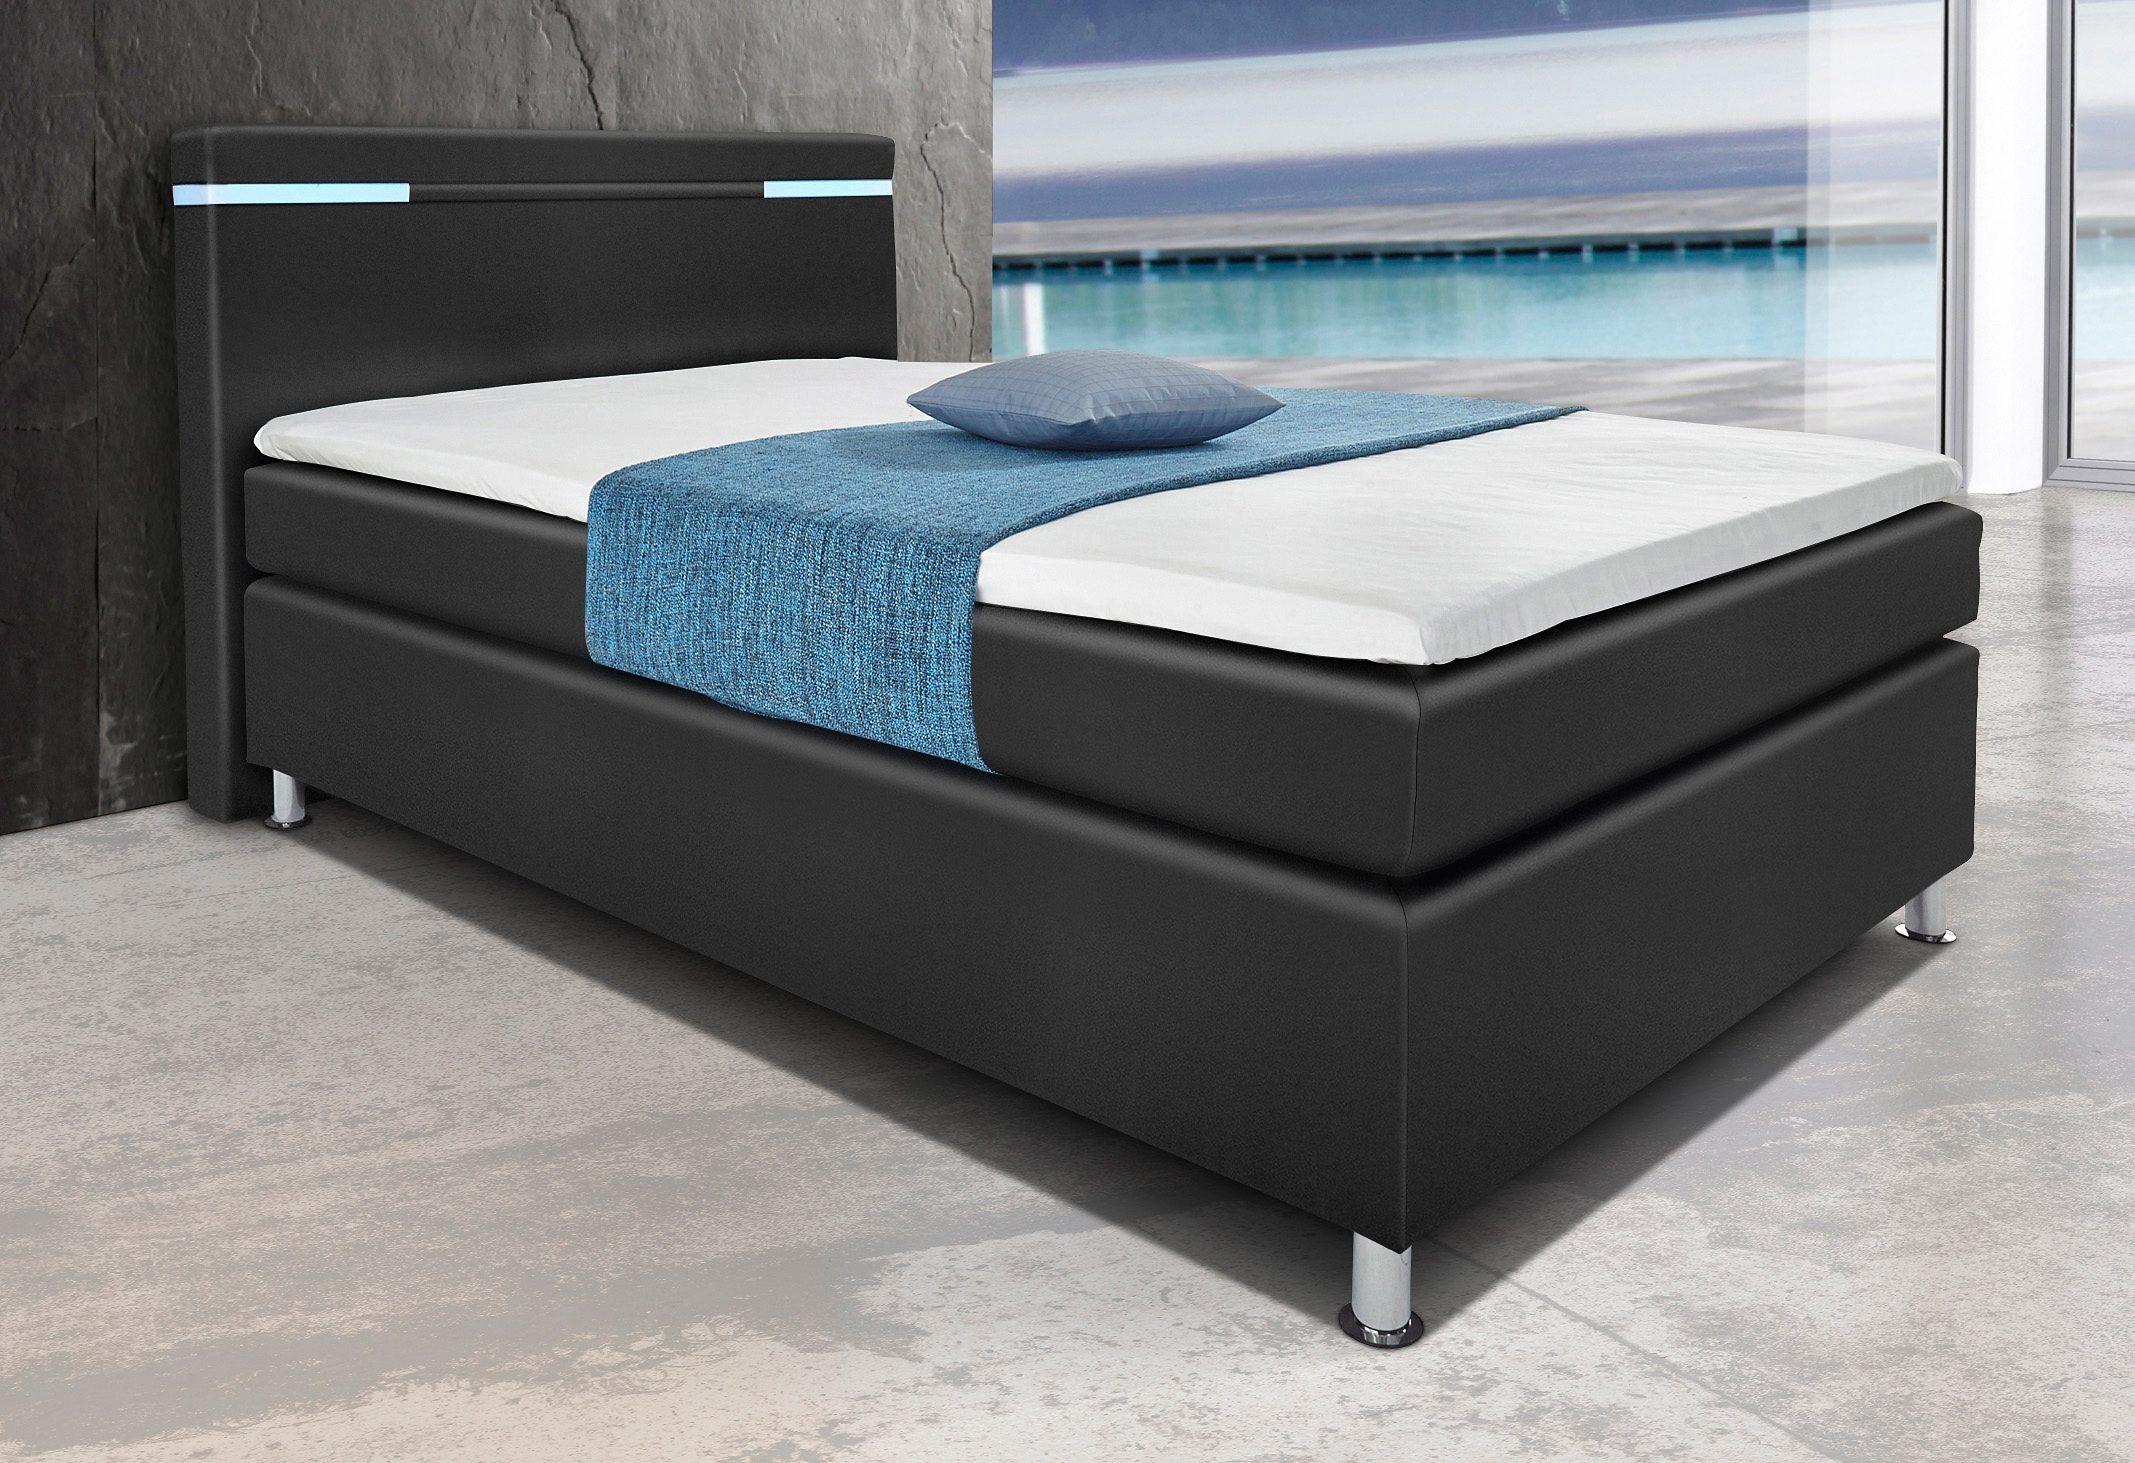 hapo Boxspringbett mit LED-RGB-Beleuchtung | Schlafzimmer > Betten > Boxspringbetten | Schwarz | Ab - Stoff - Polyester | HAPO